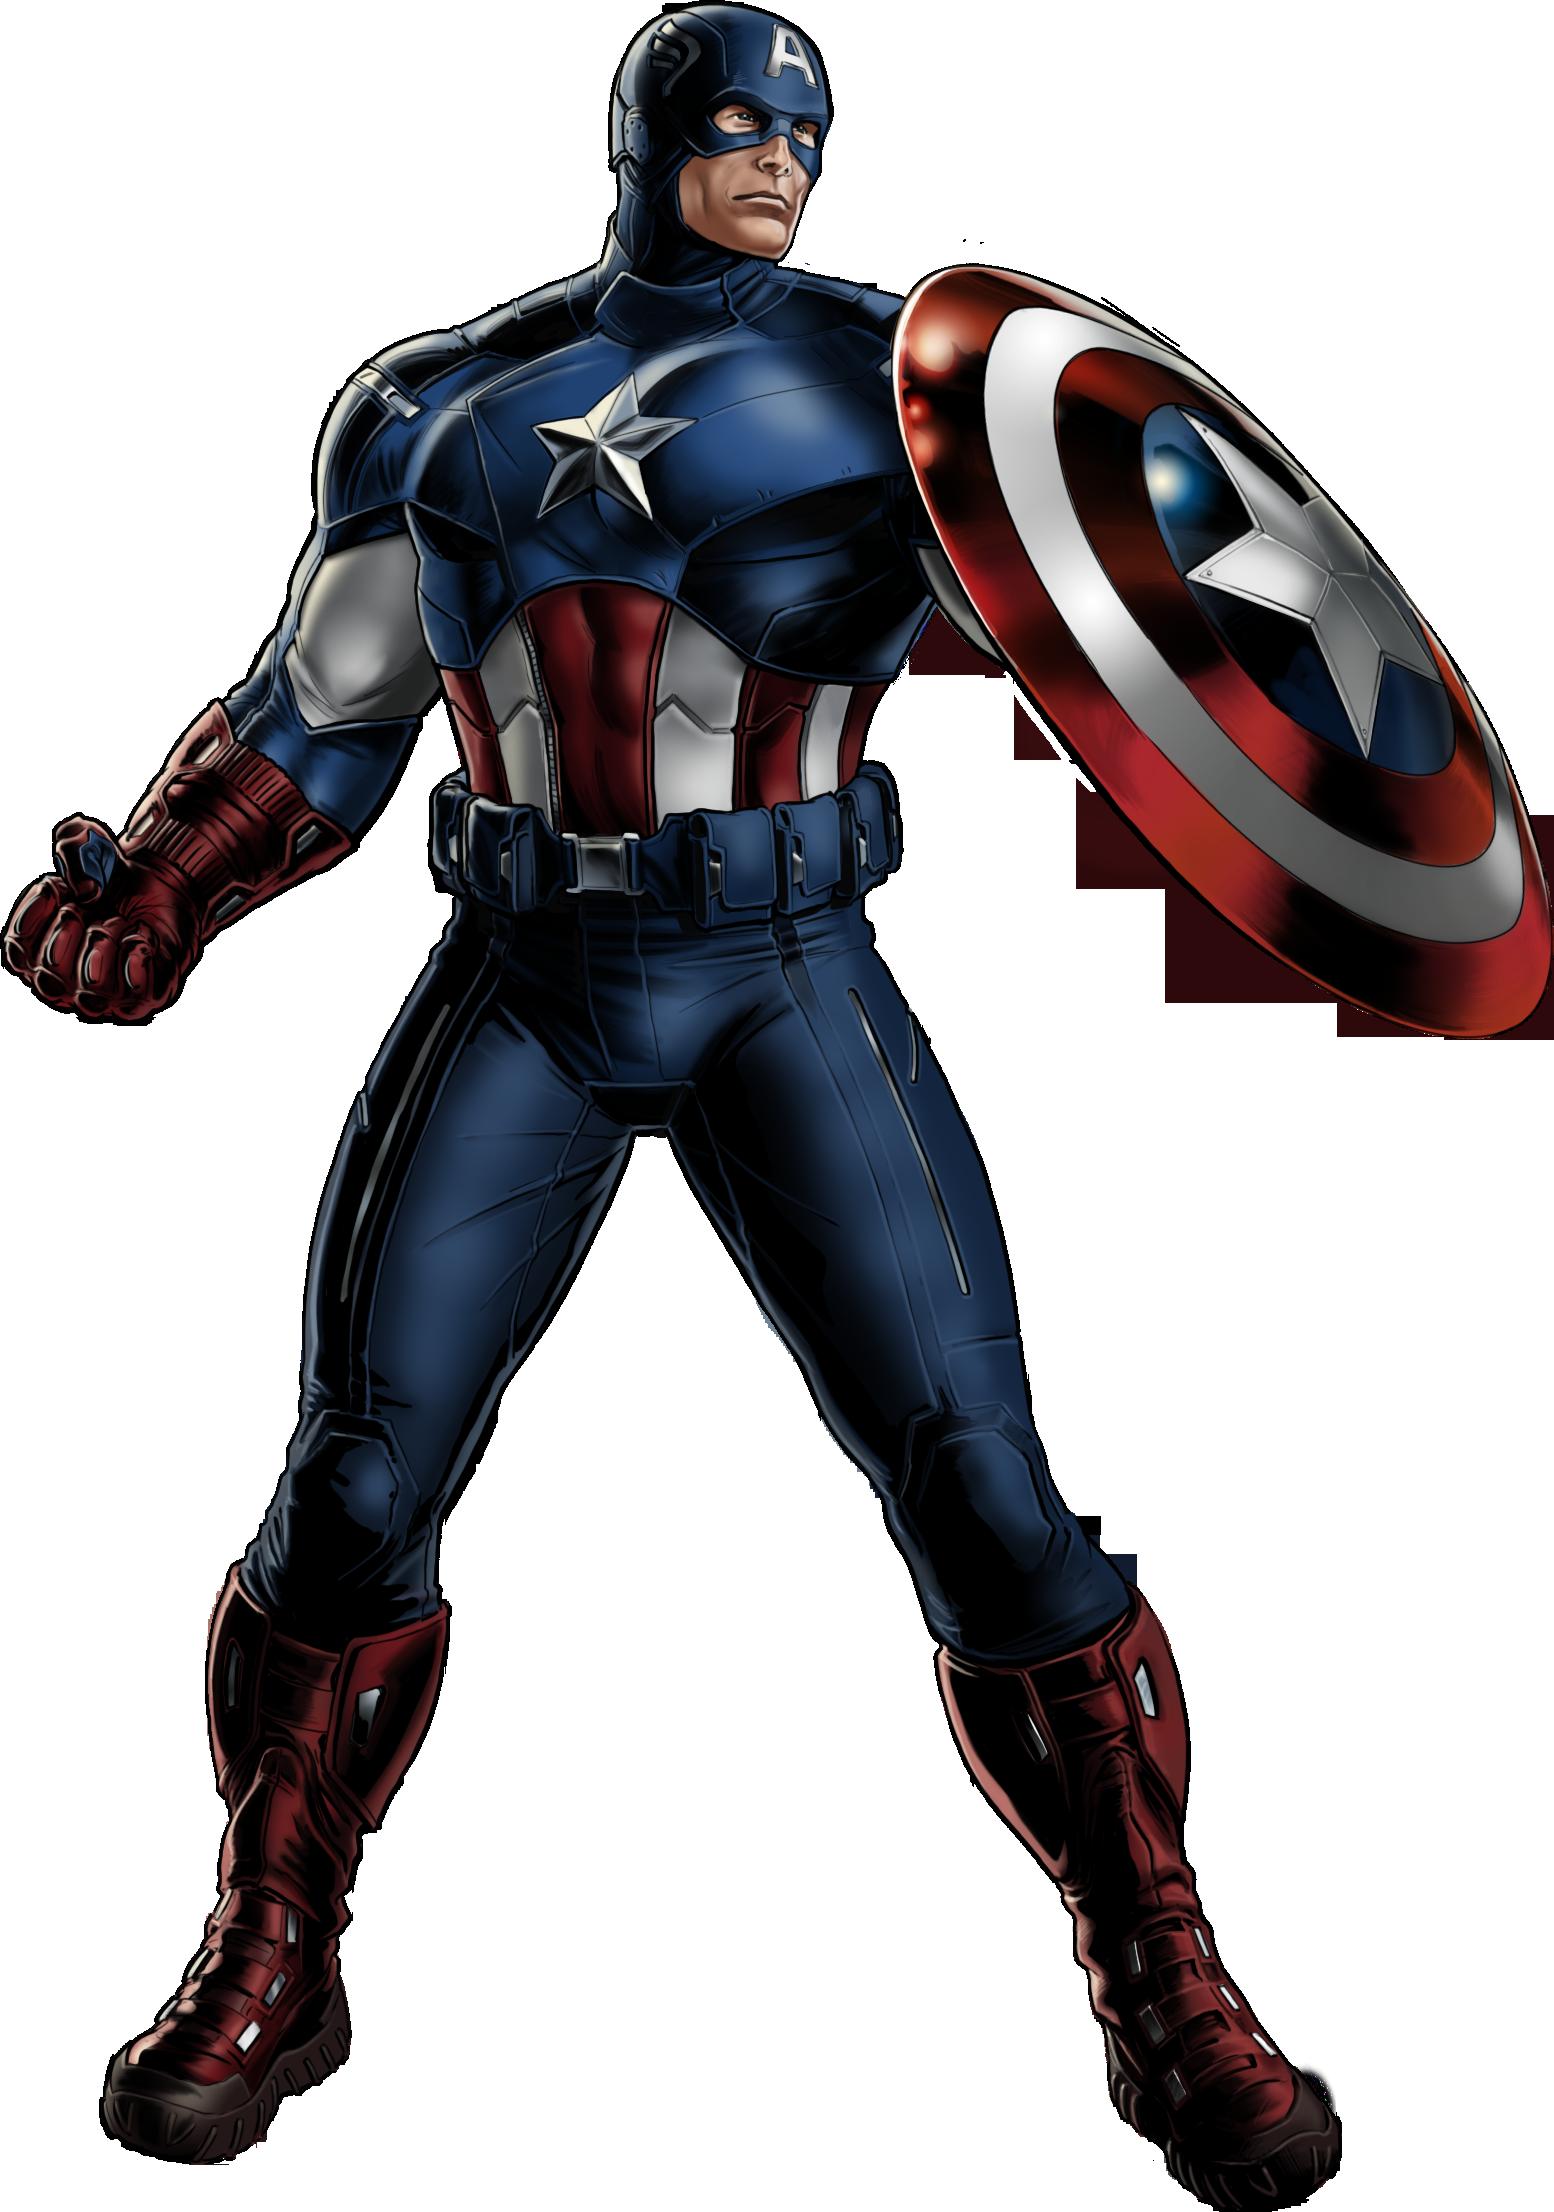 Avengers: War of Heroes